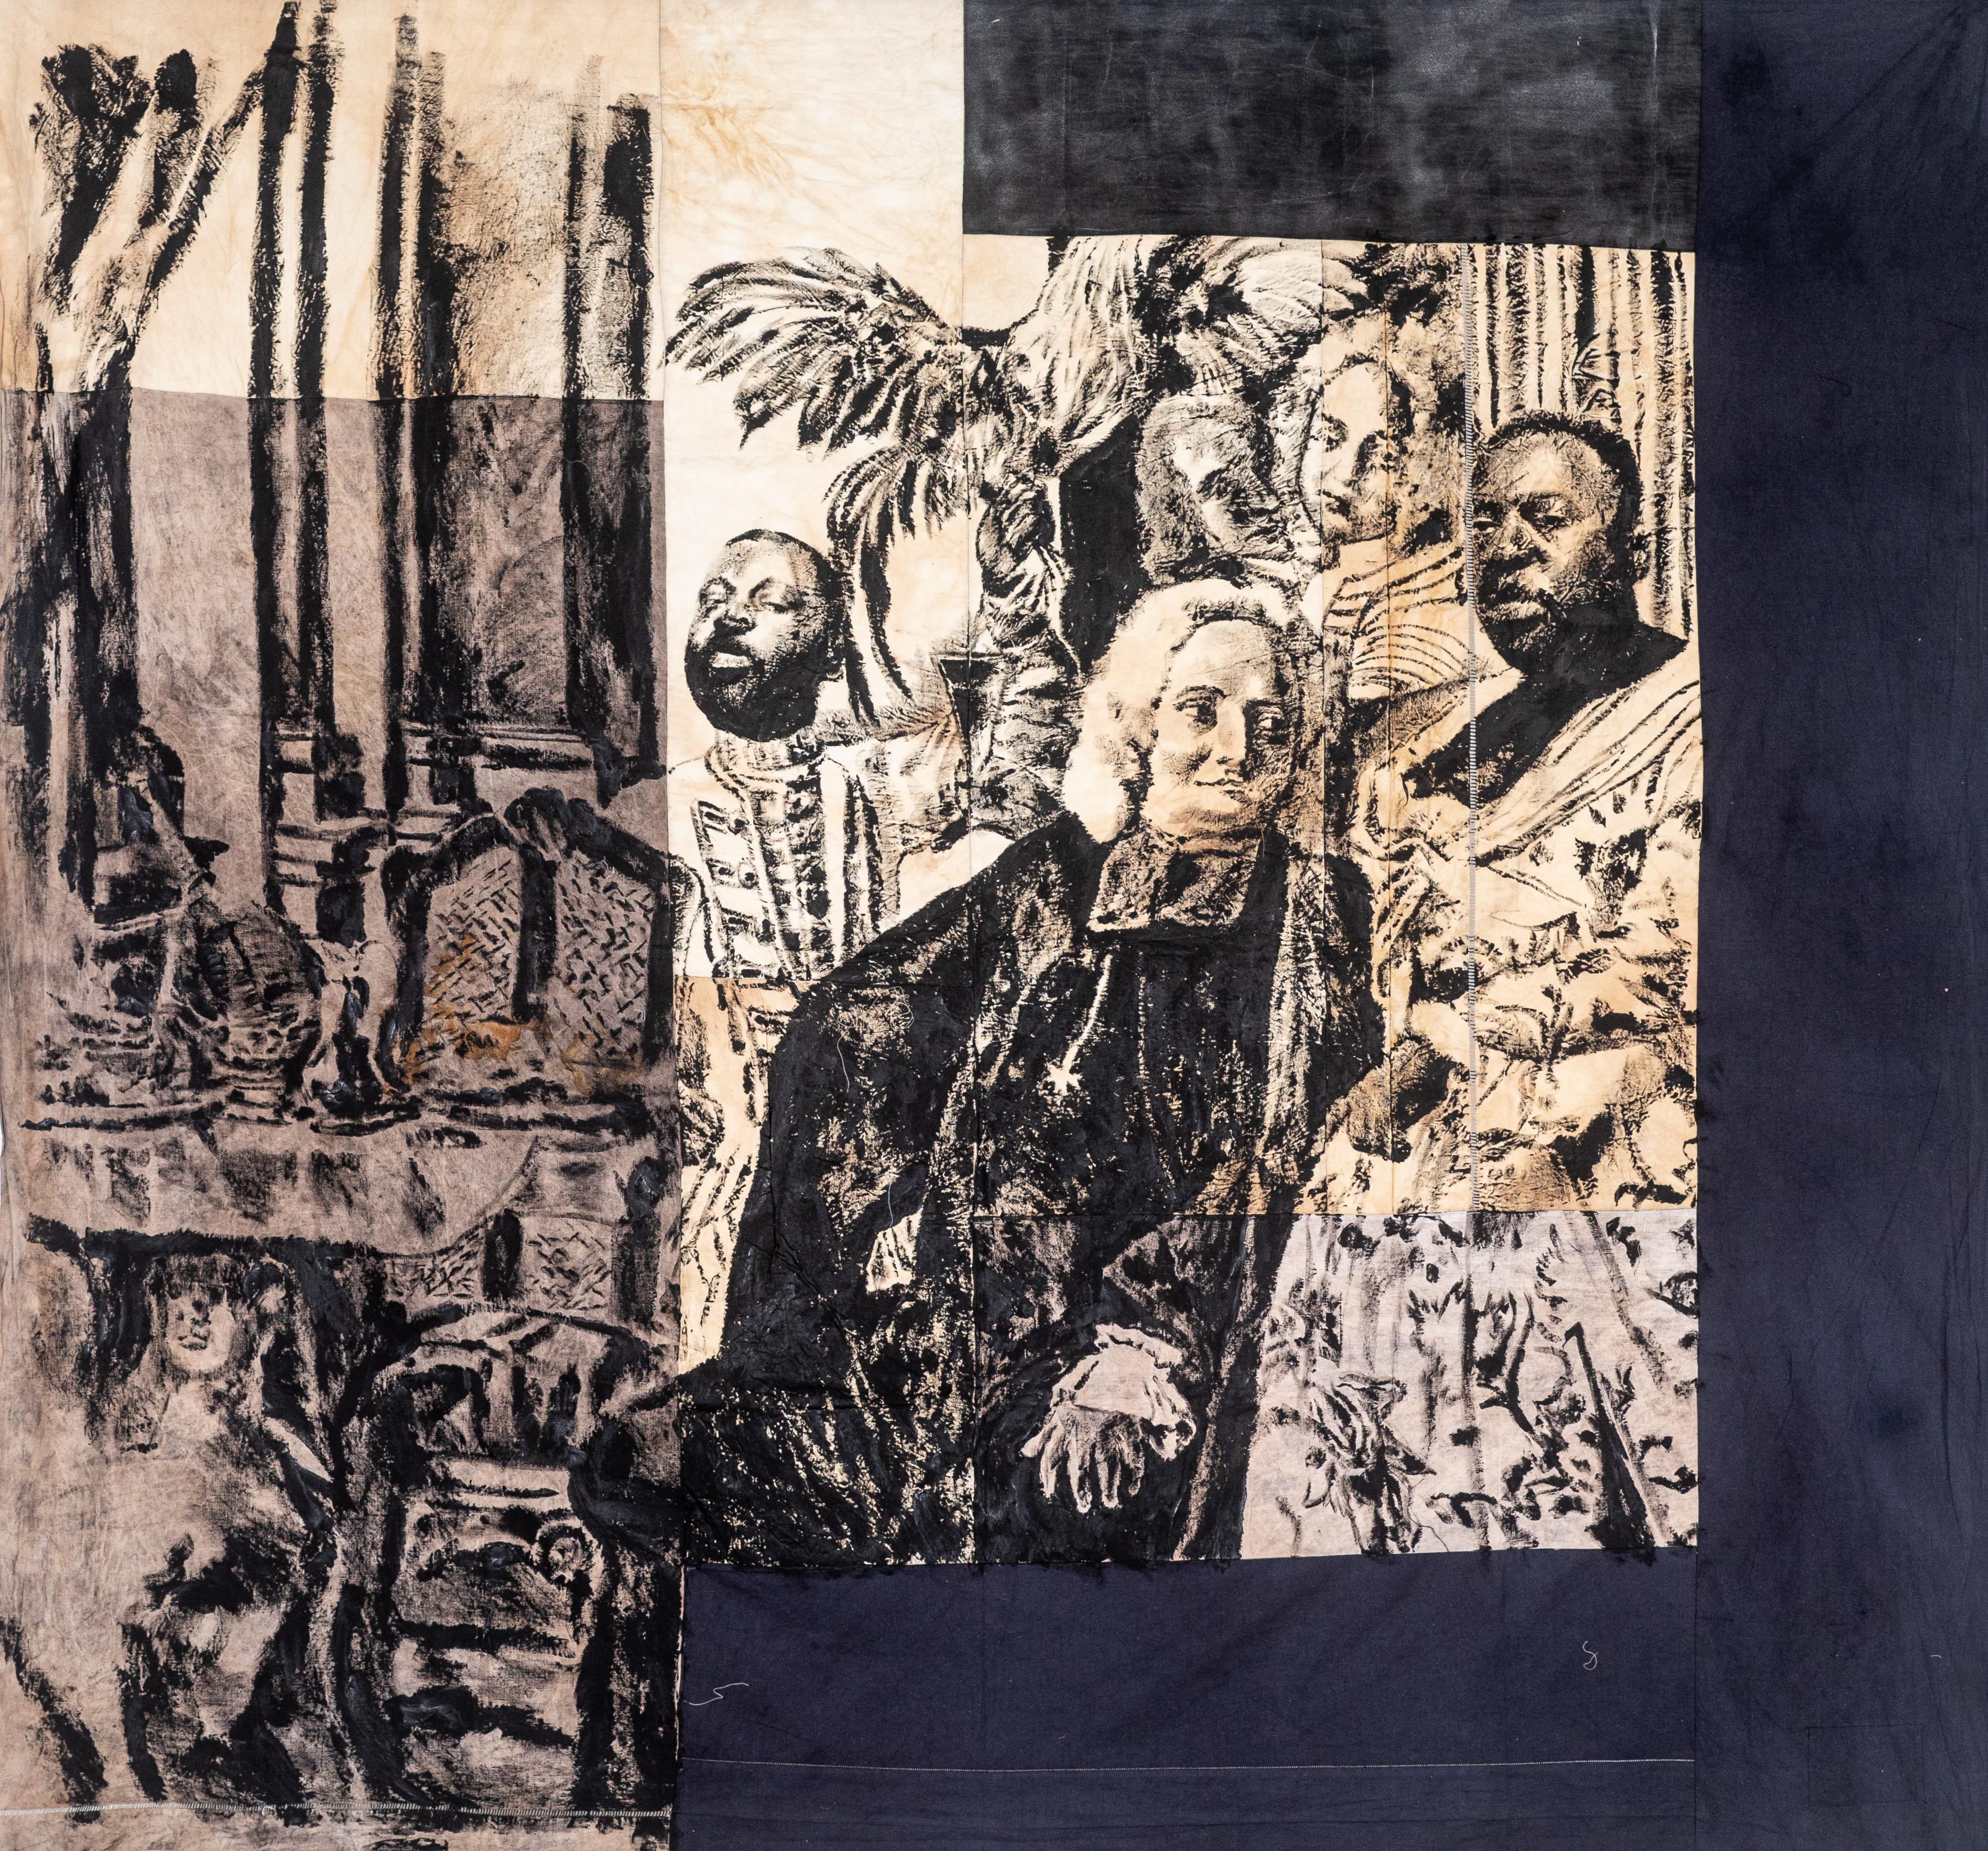 Galerie_Fakhoury - 13-09-2020 - HD - JPG (sRVB) (21 of 31)